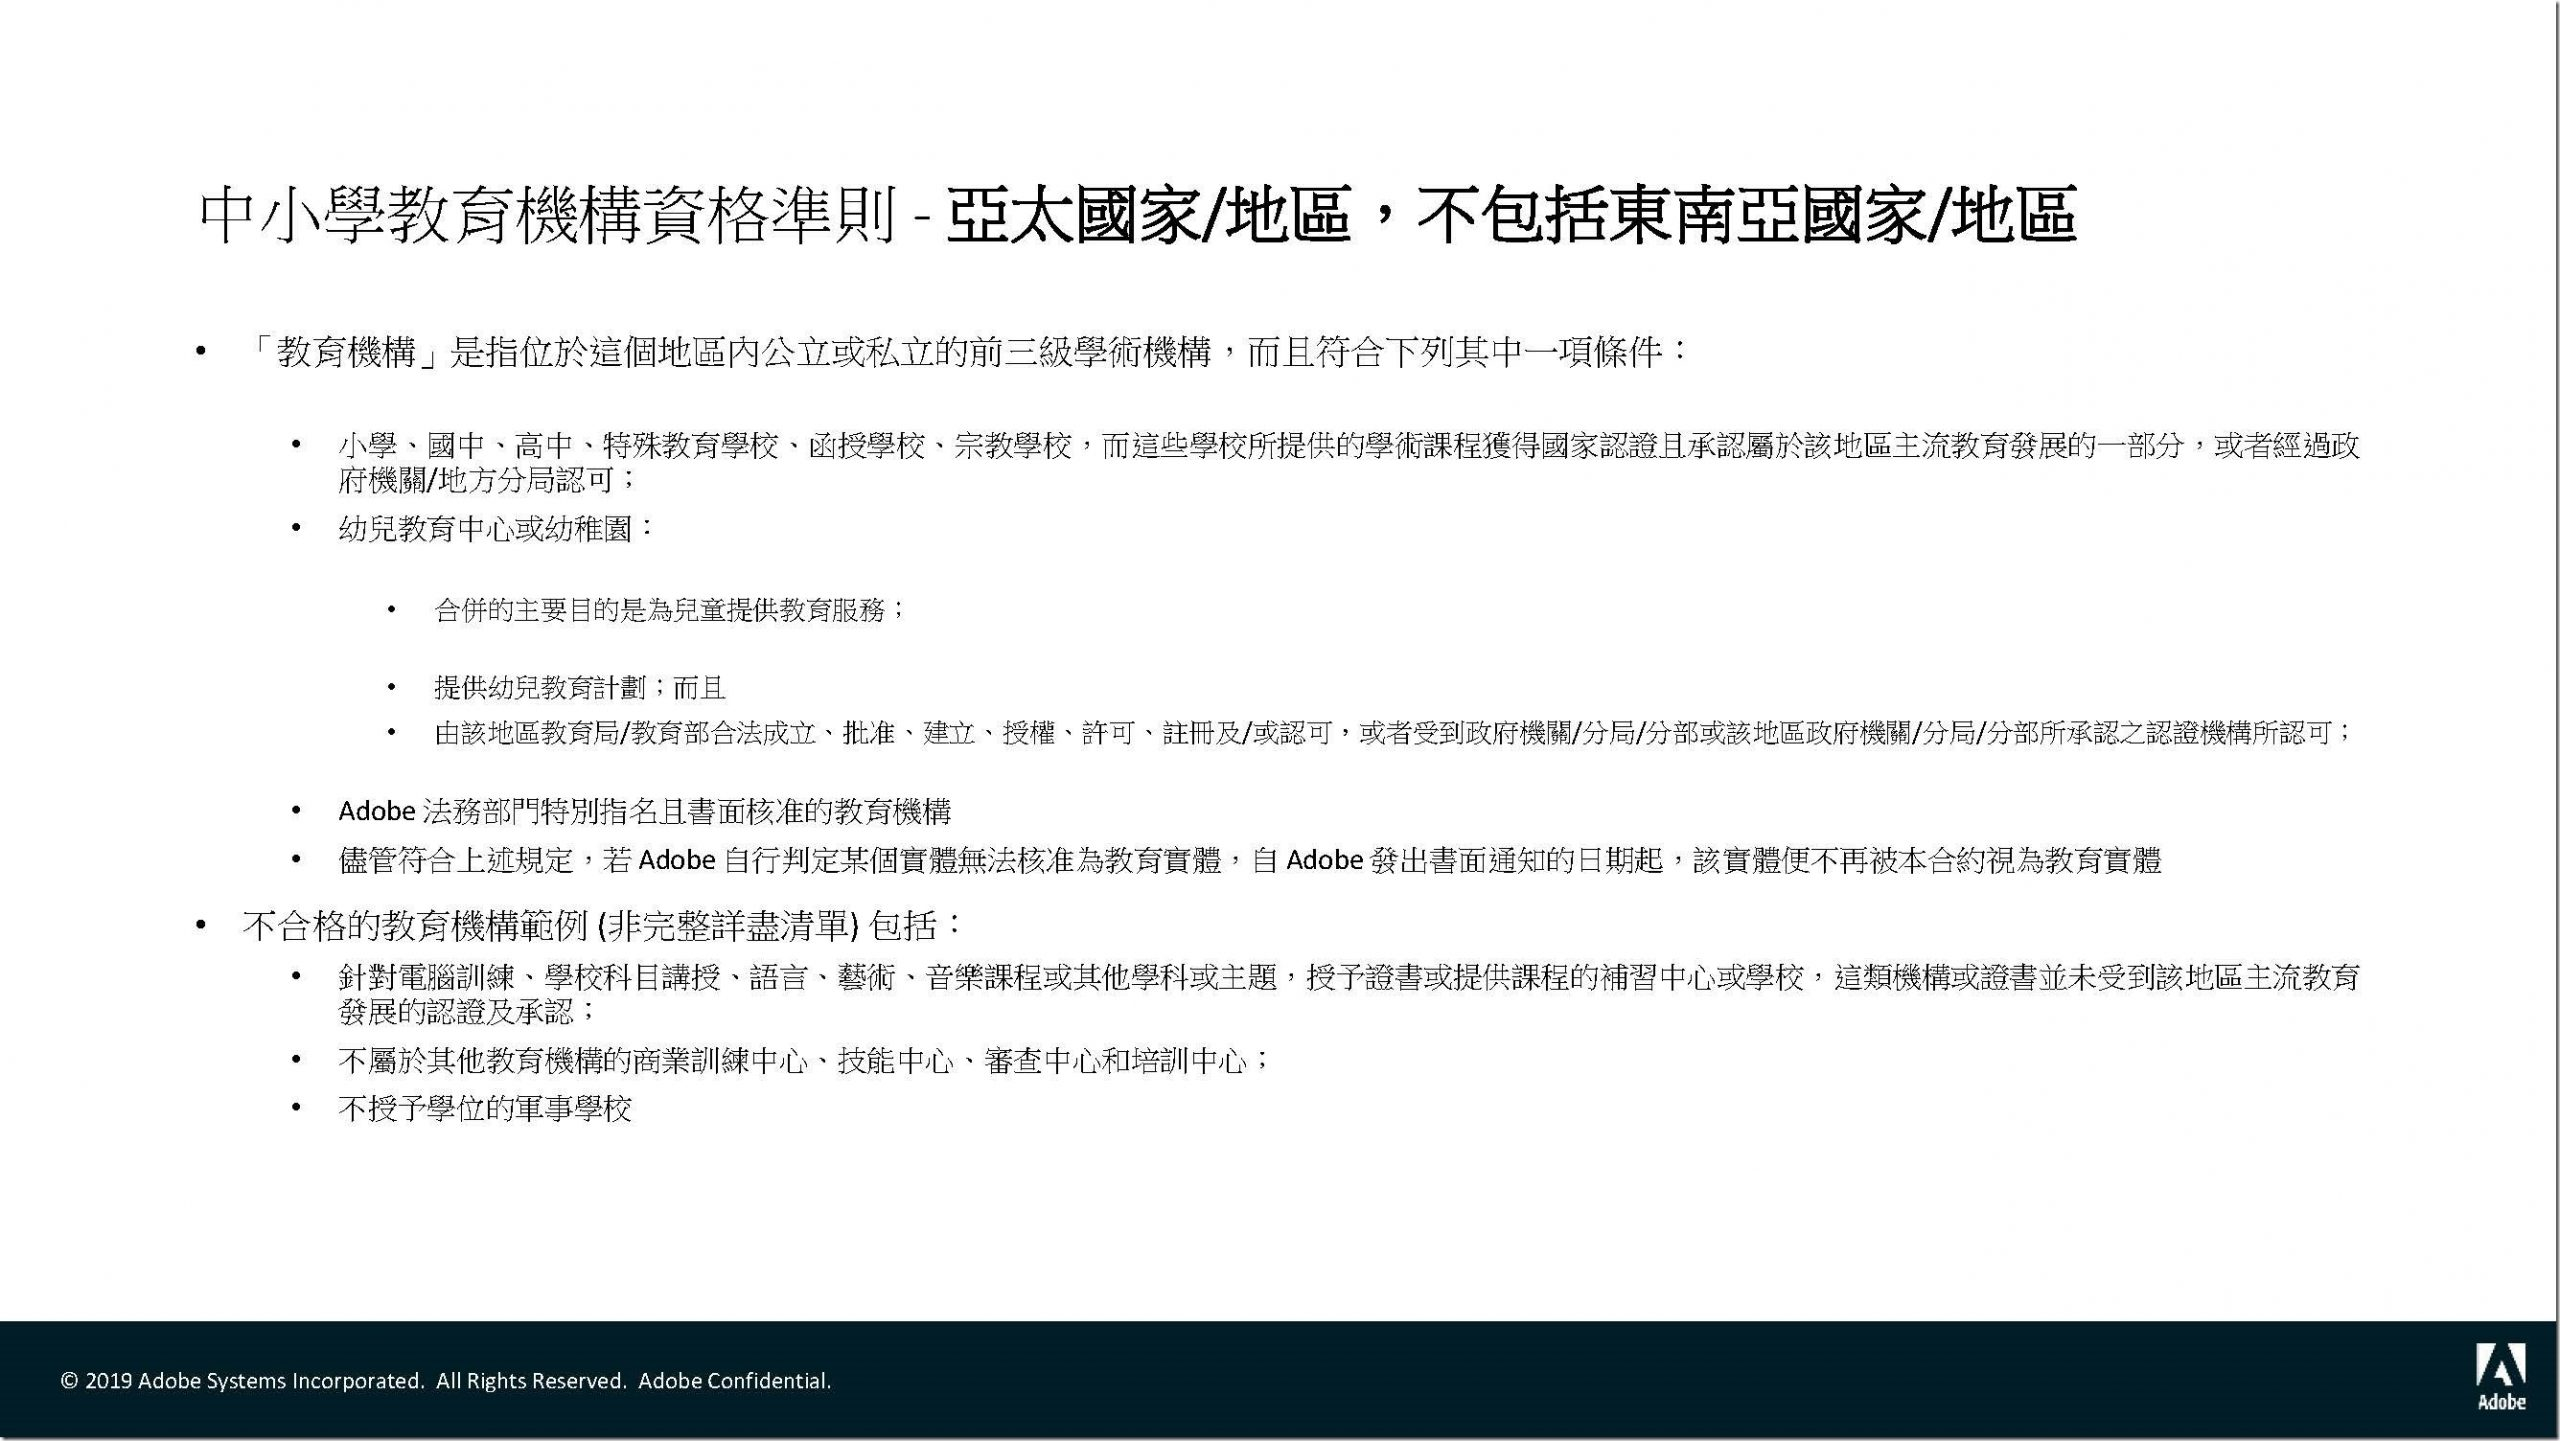 Adobe 共用裝置授權安裝指南_教育通用_頁面_07